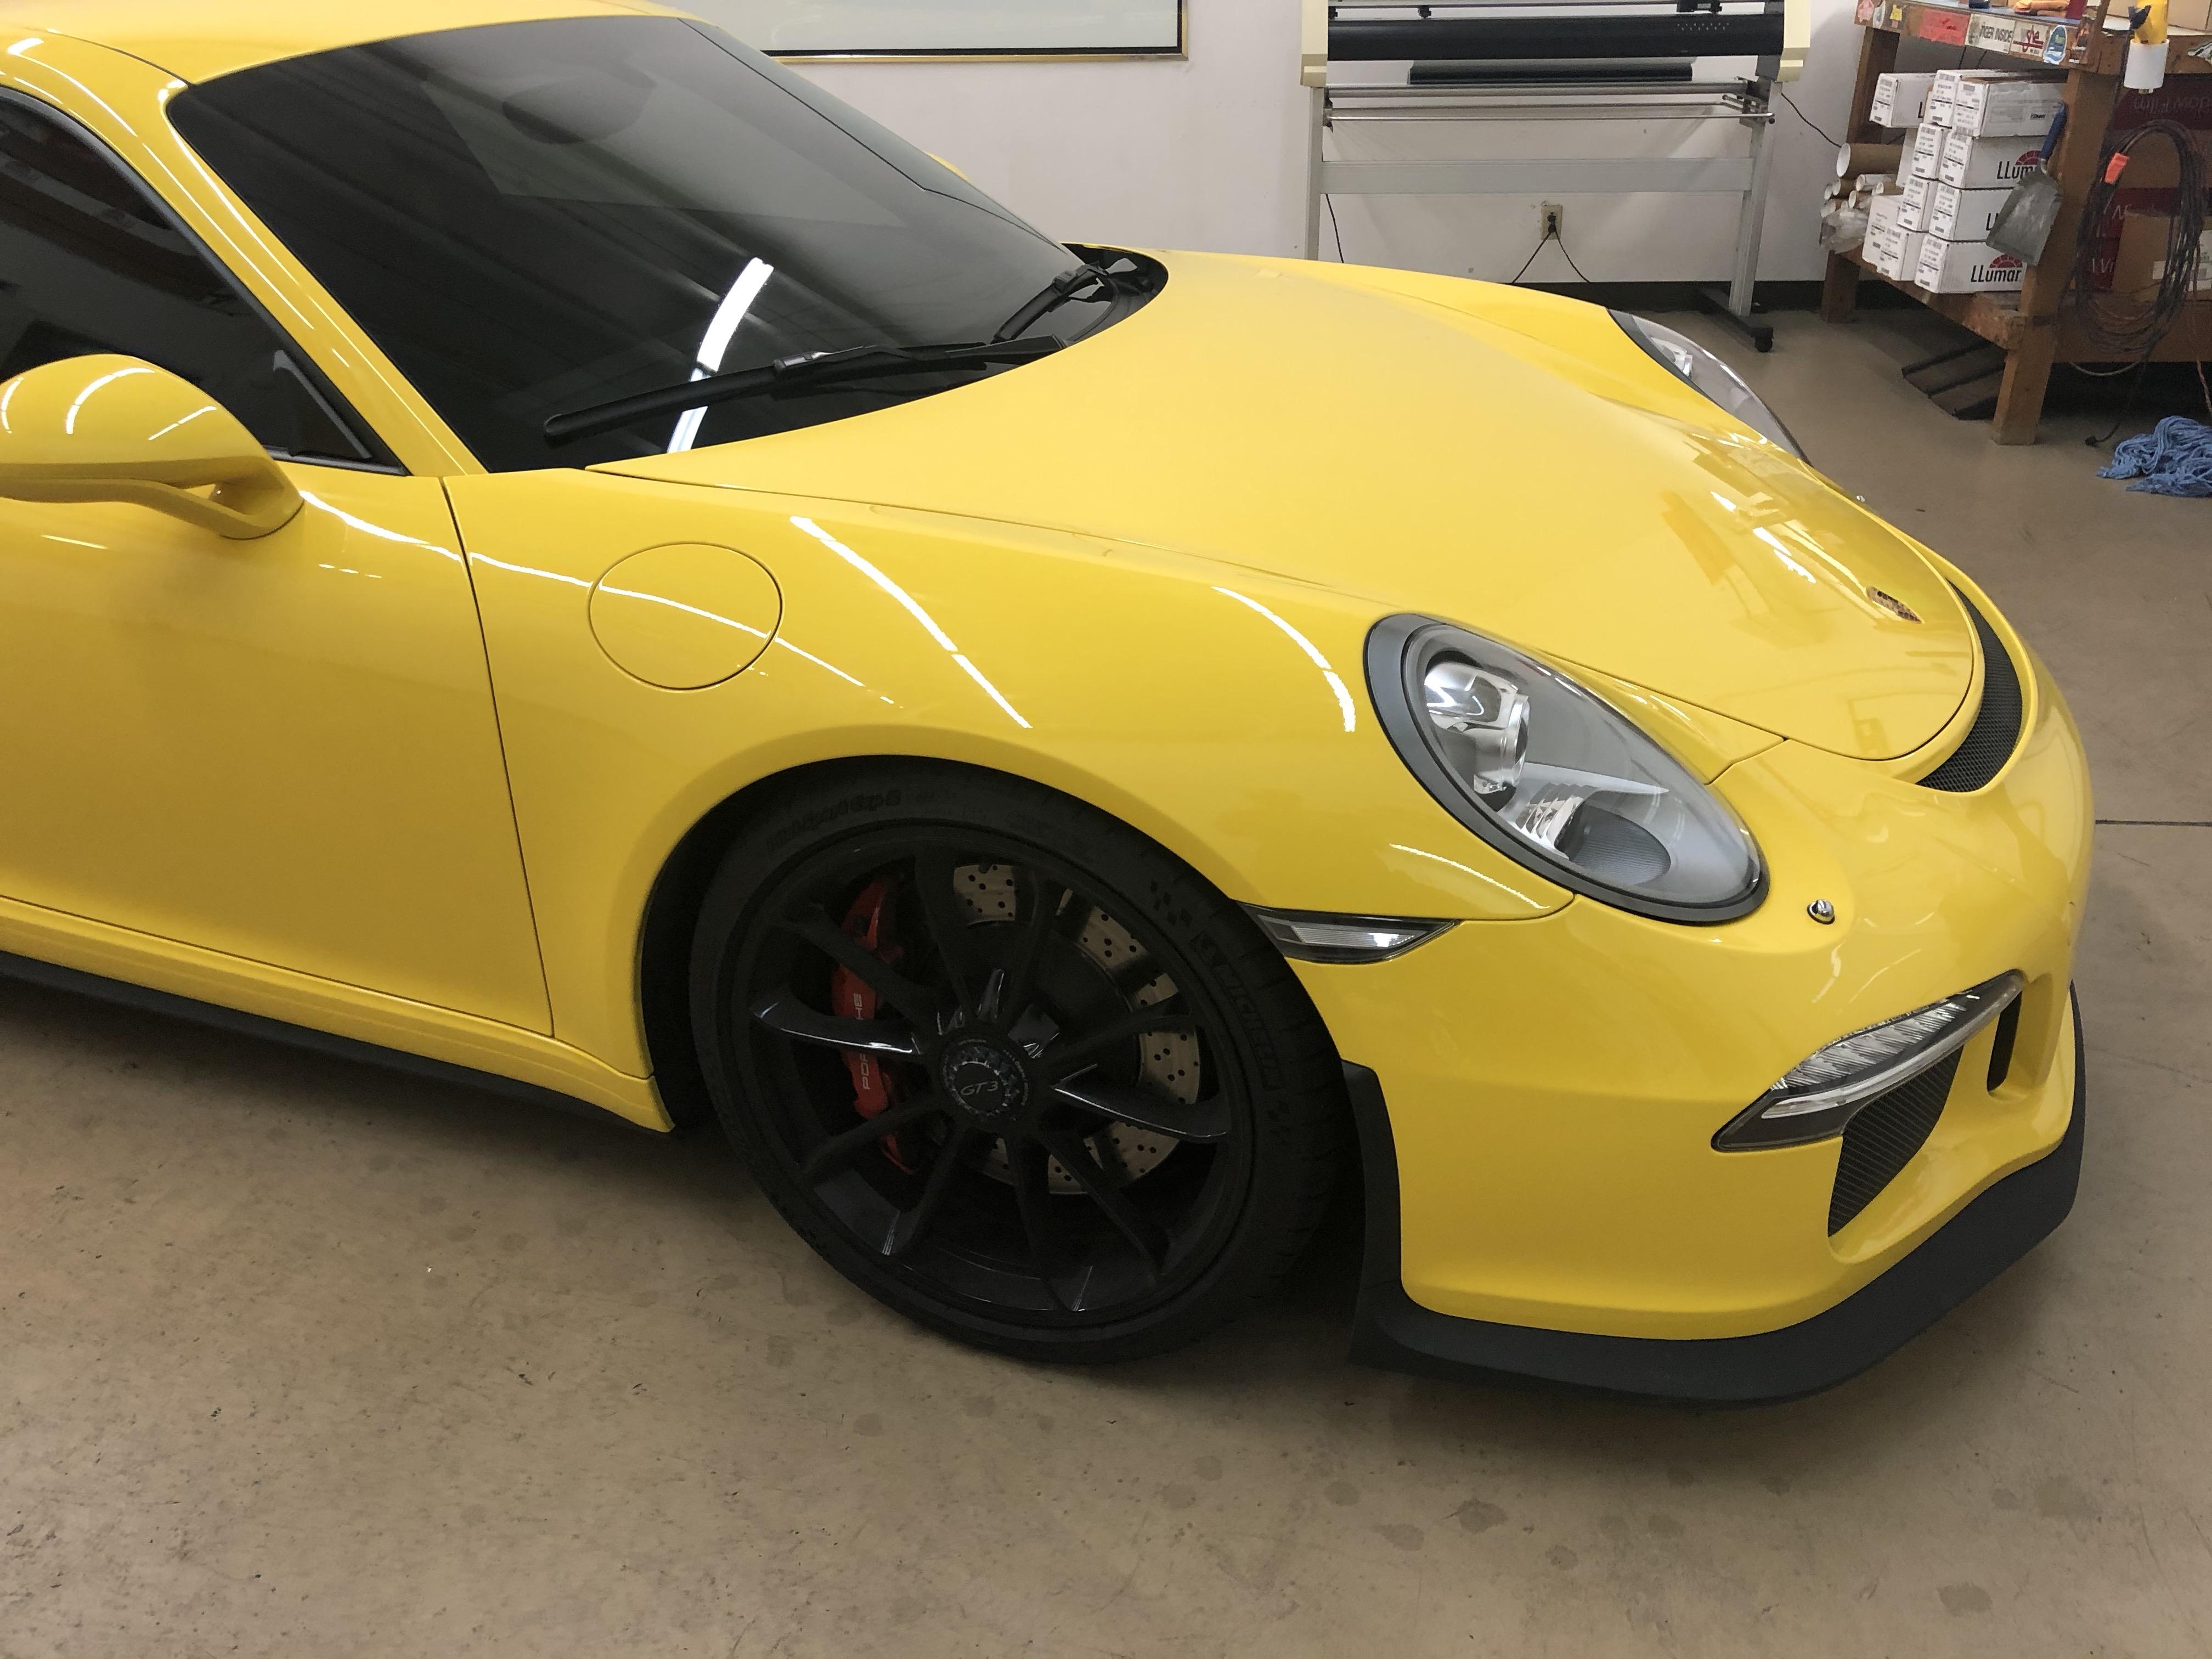 For Sale or Trade - Porsche GT3, 2yr CPO + 5yr engine ...